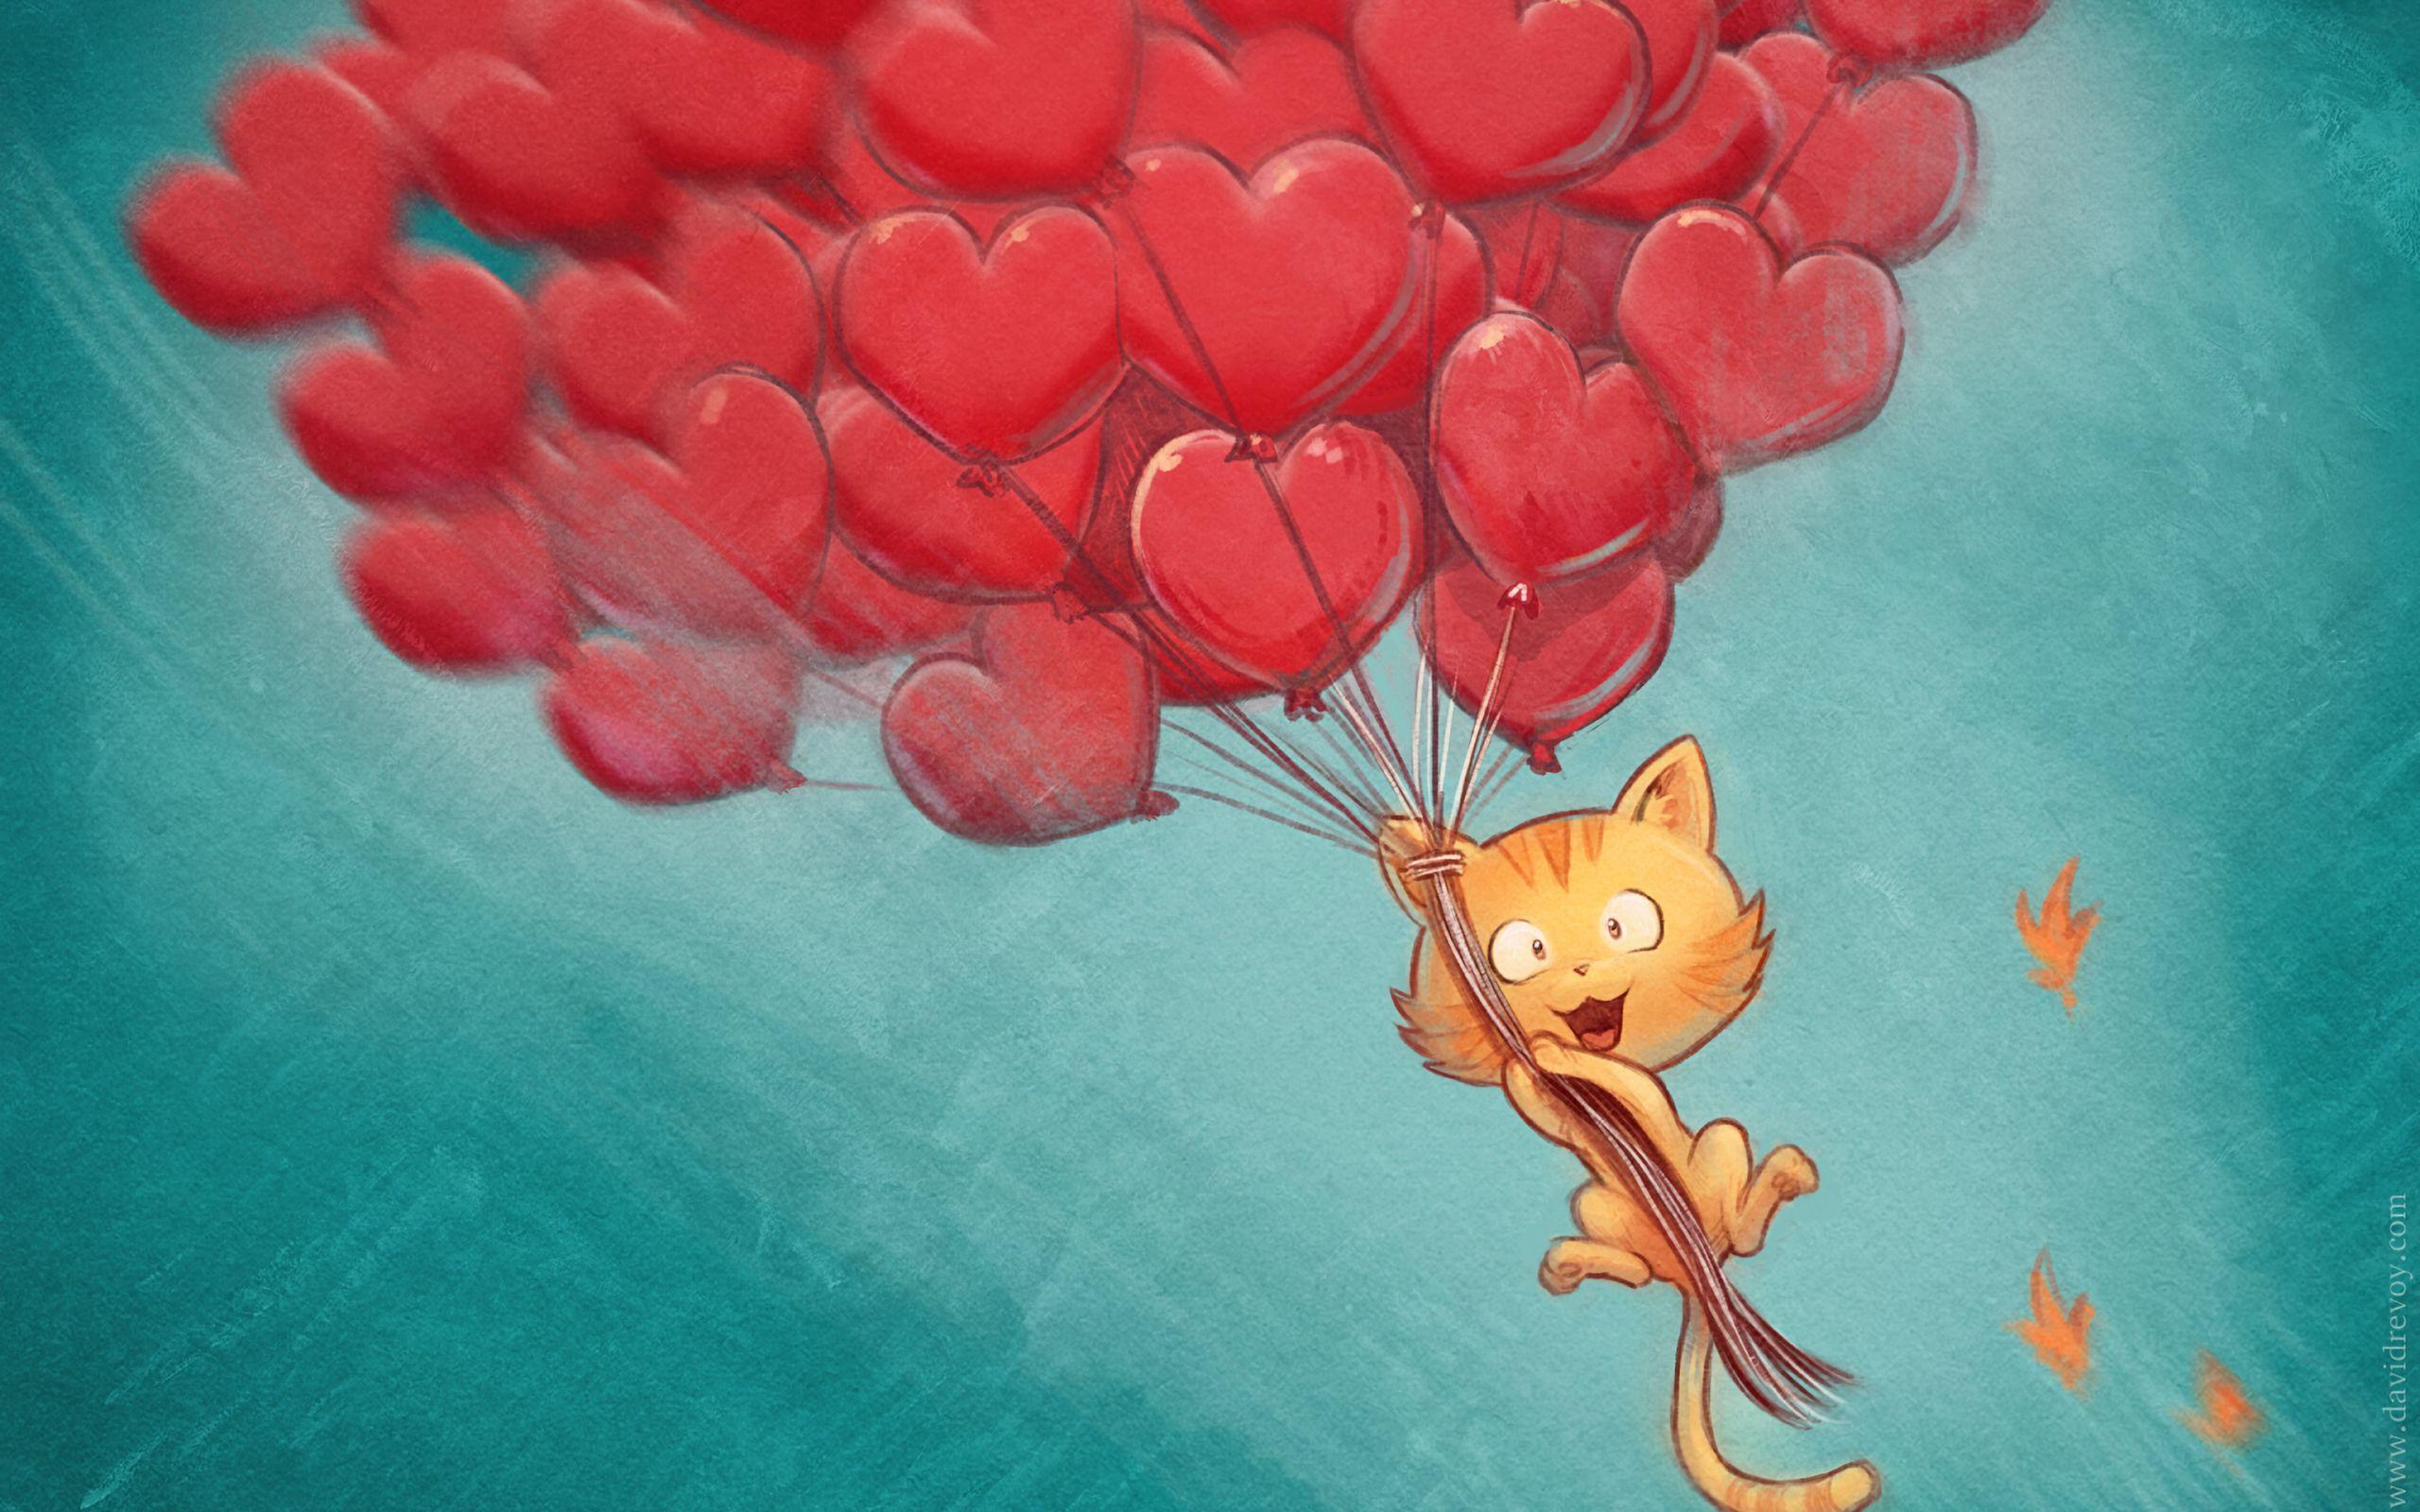 2560x1600 Wallpaper cat, balloons, hearts, flight, sky, art